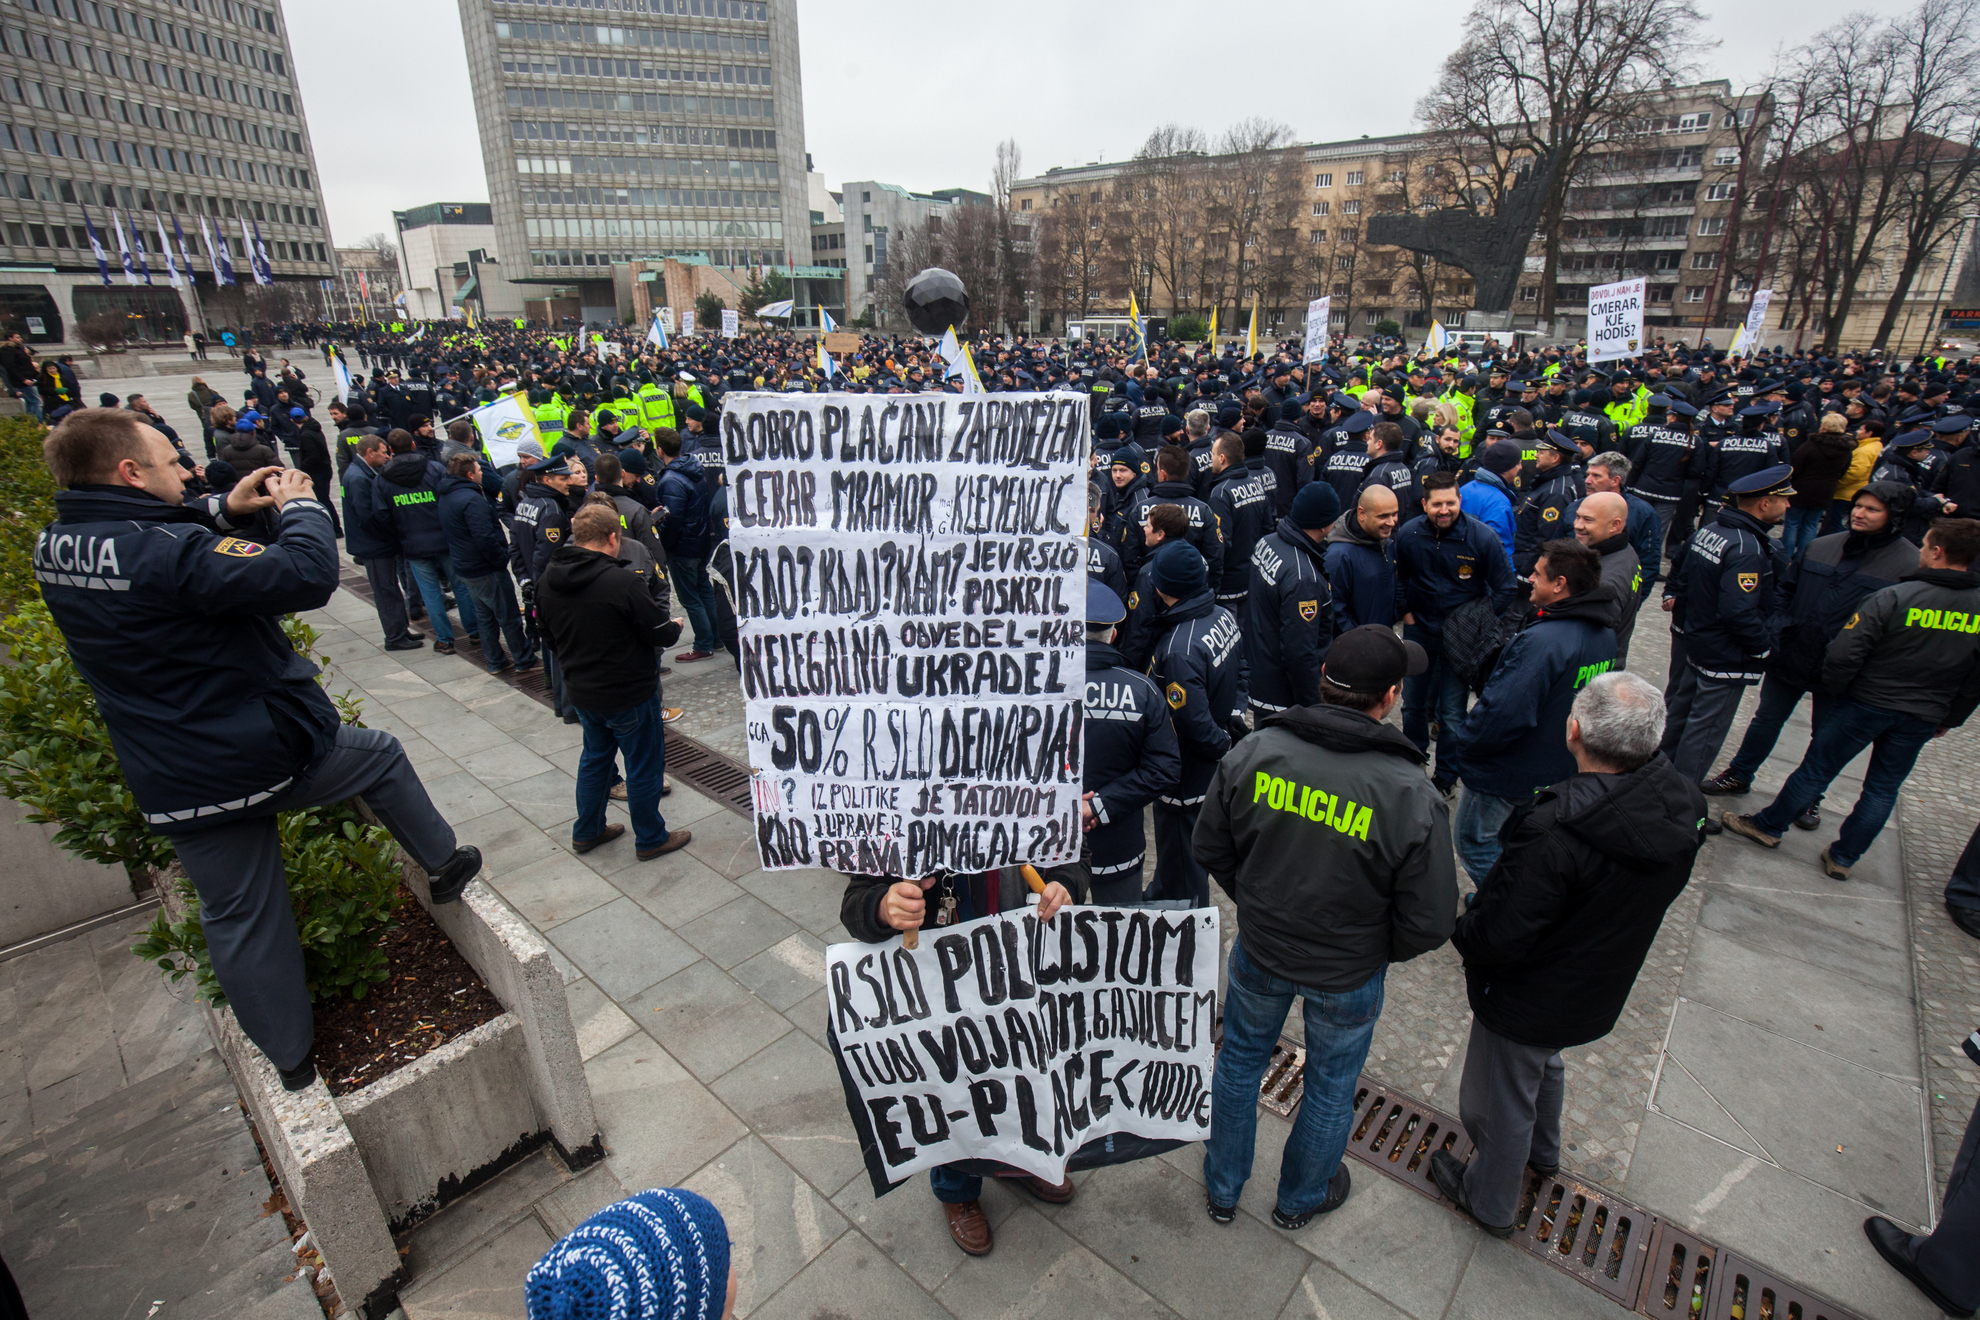 Ljubljana, Stavka policistov. Stavkajoči policisti na Tgu republike.